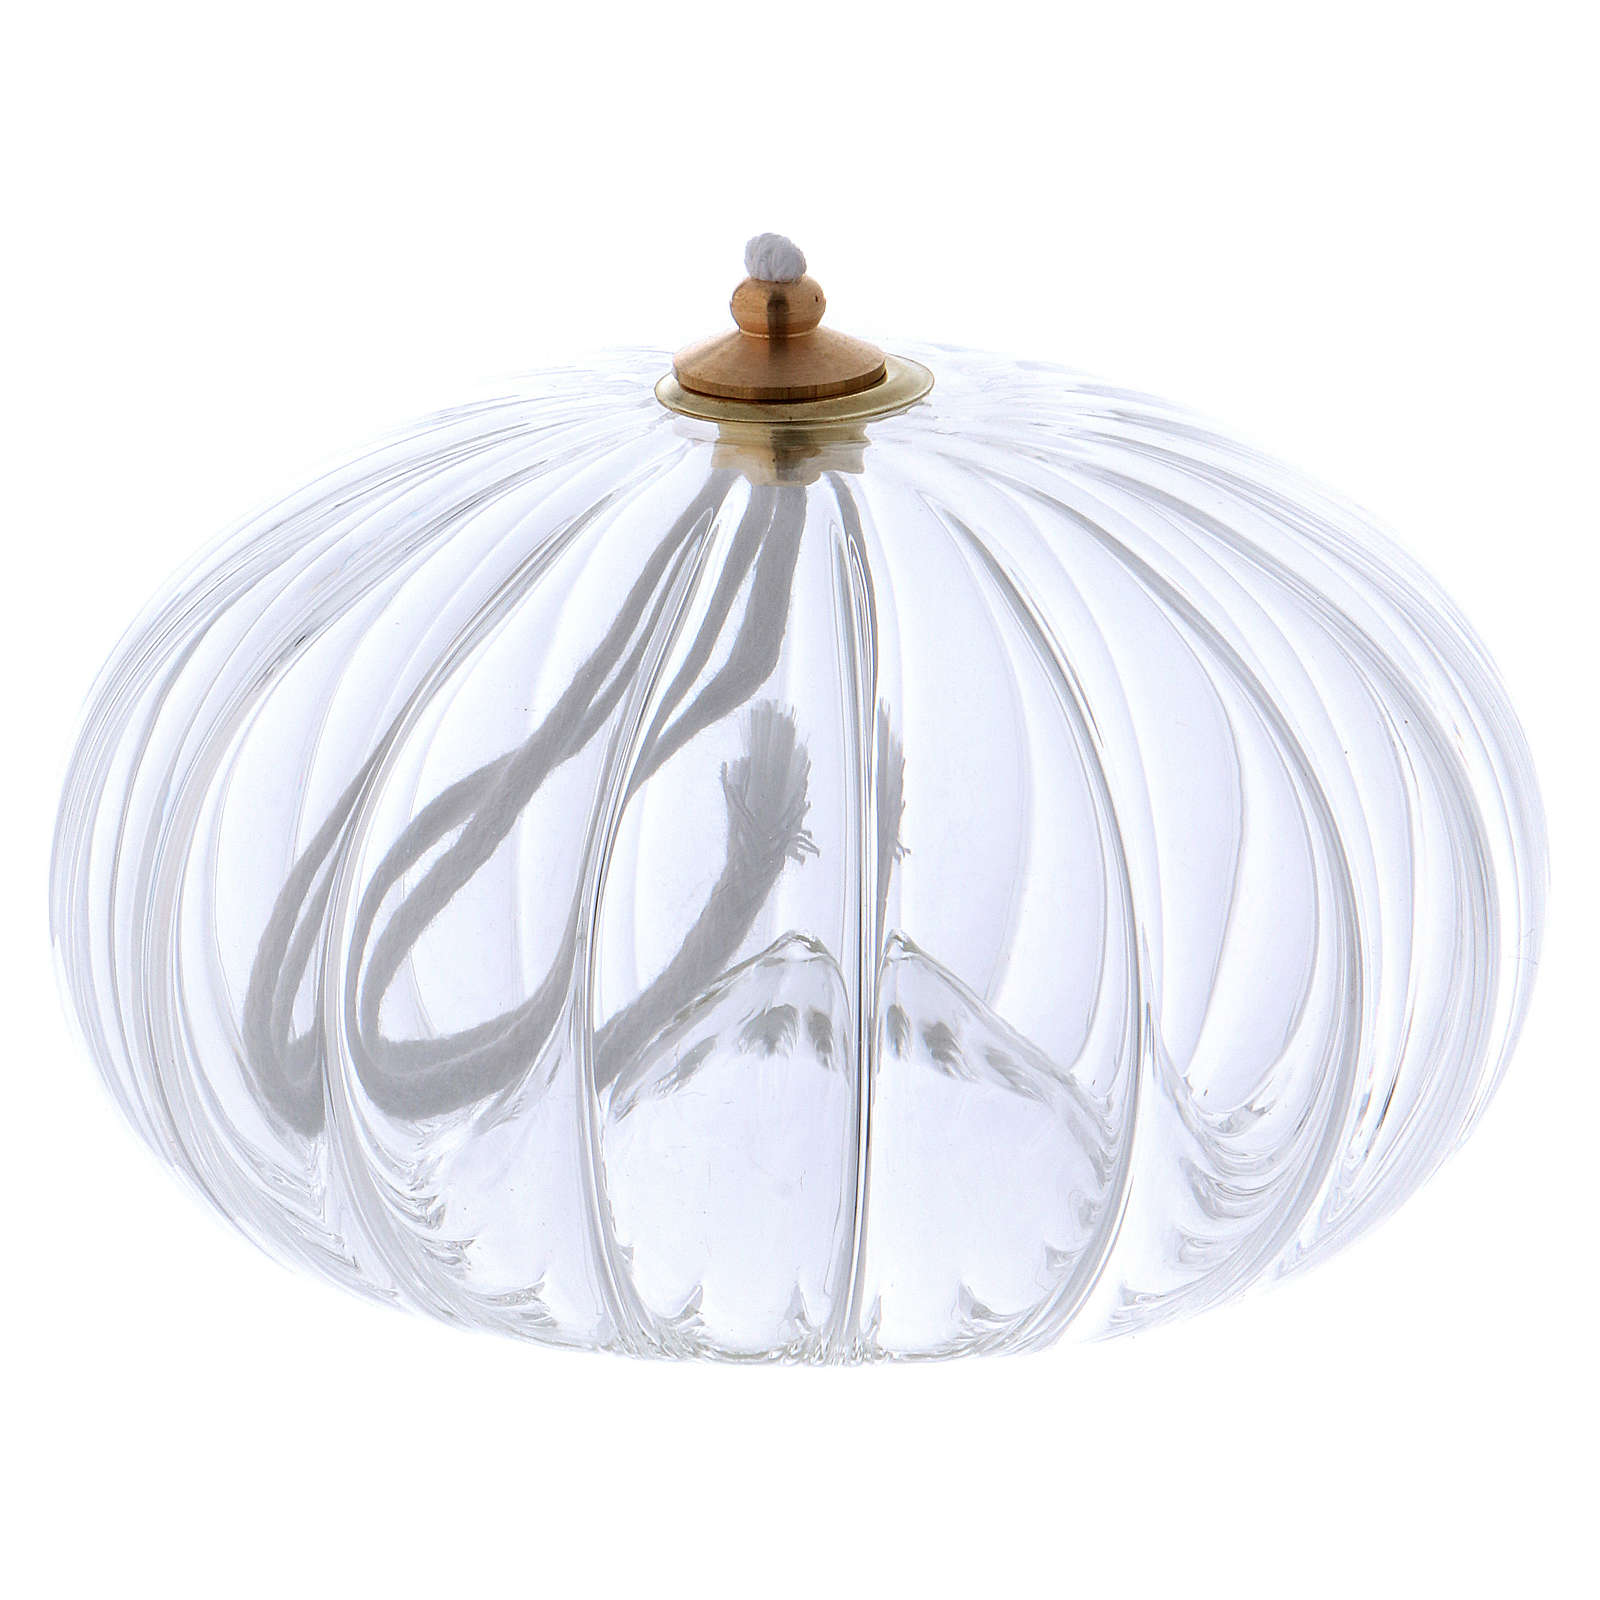 Transparent glass oil lamp, pomegranate shaped 3